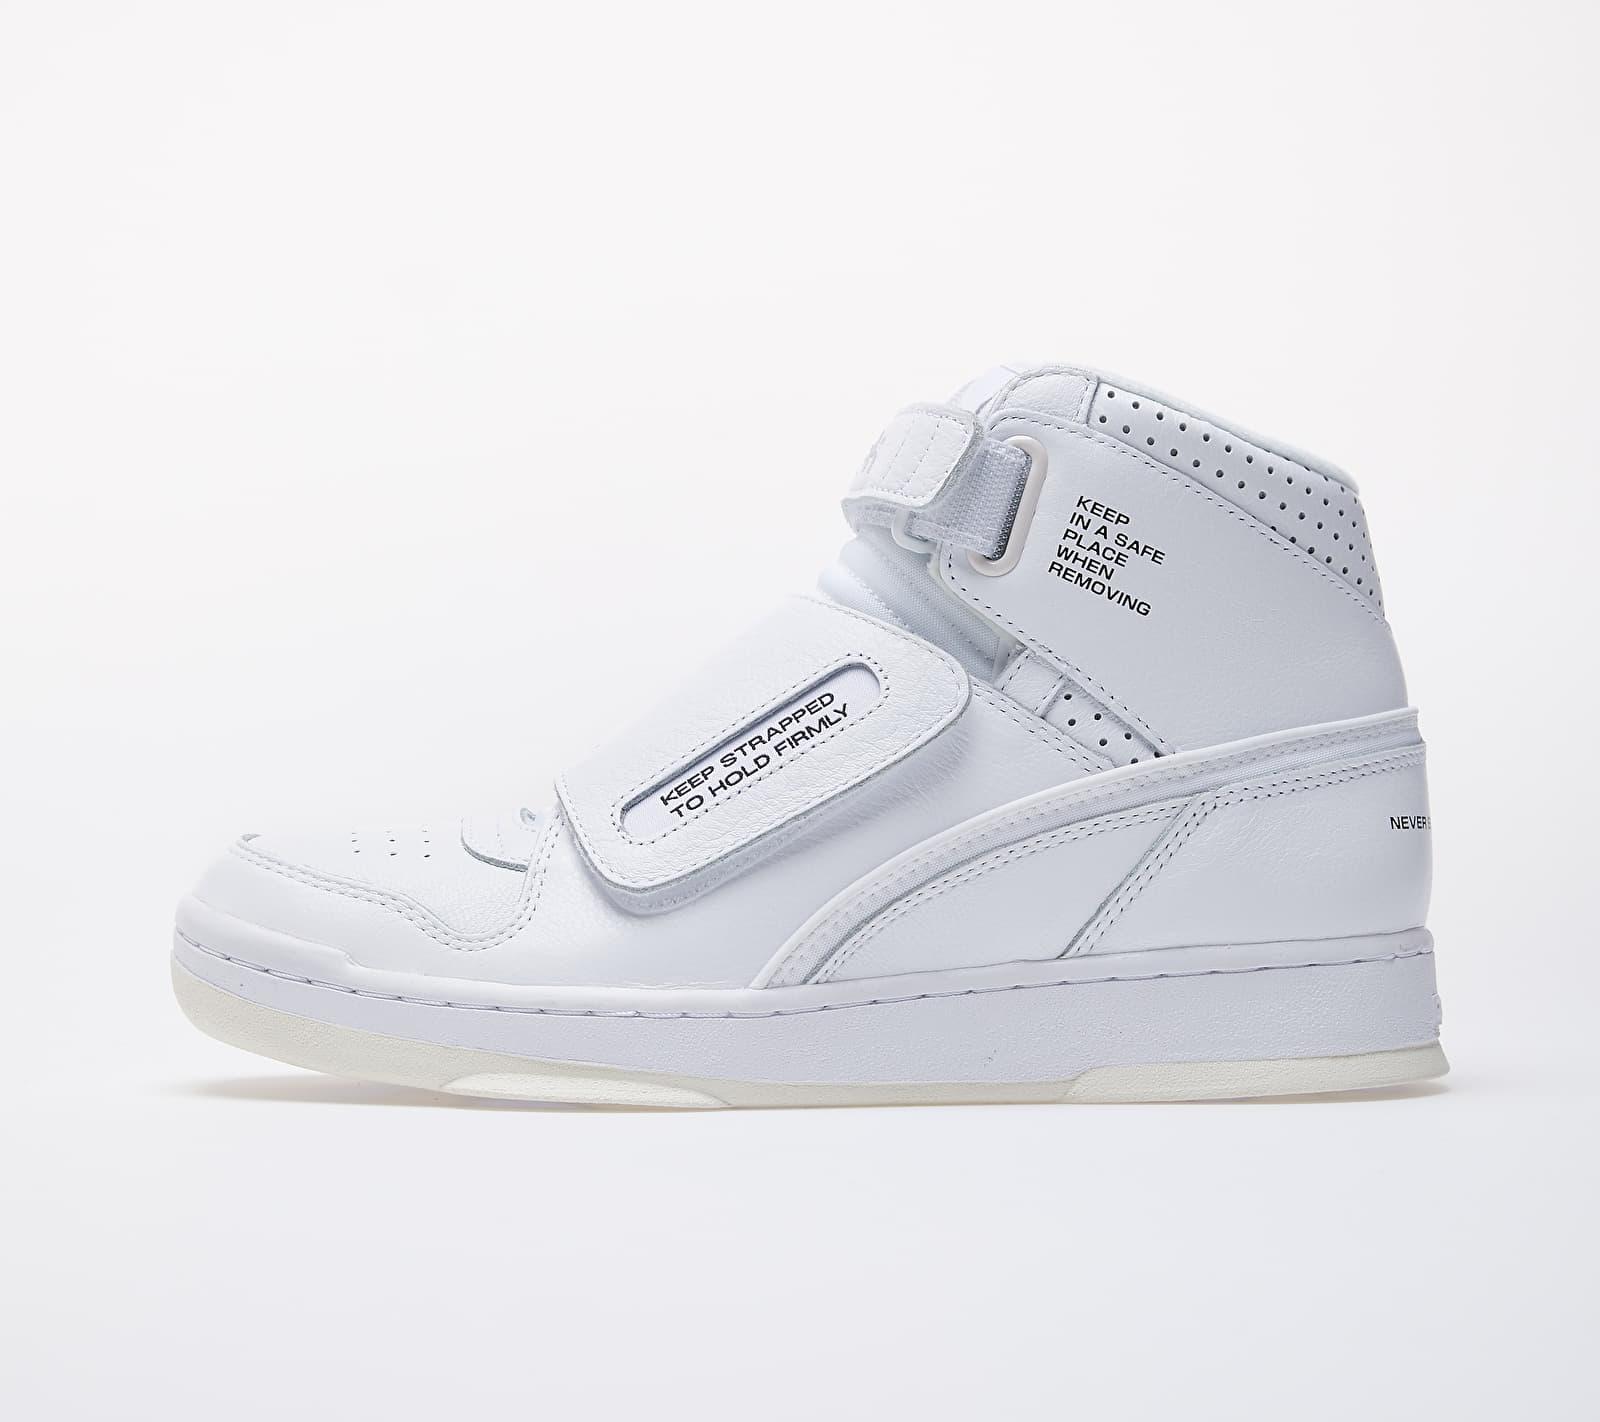 Reebok Alien Stomper M R White/ Black/ Porcel EUR 40.5